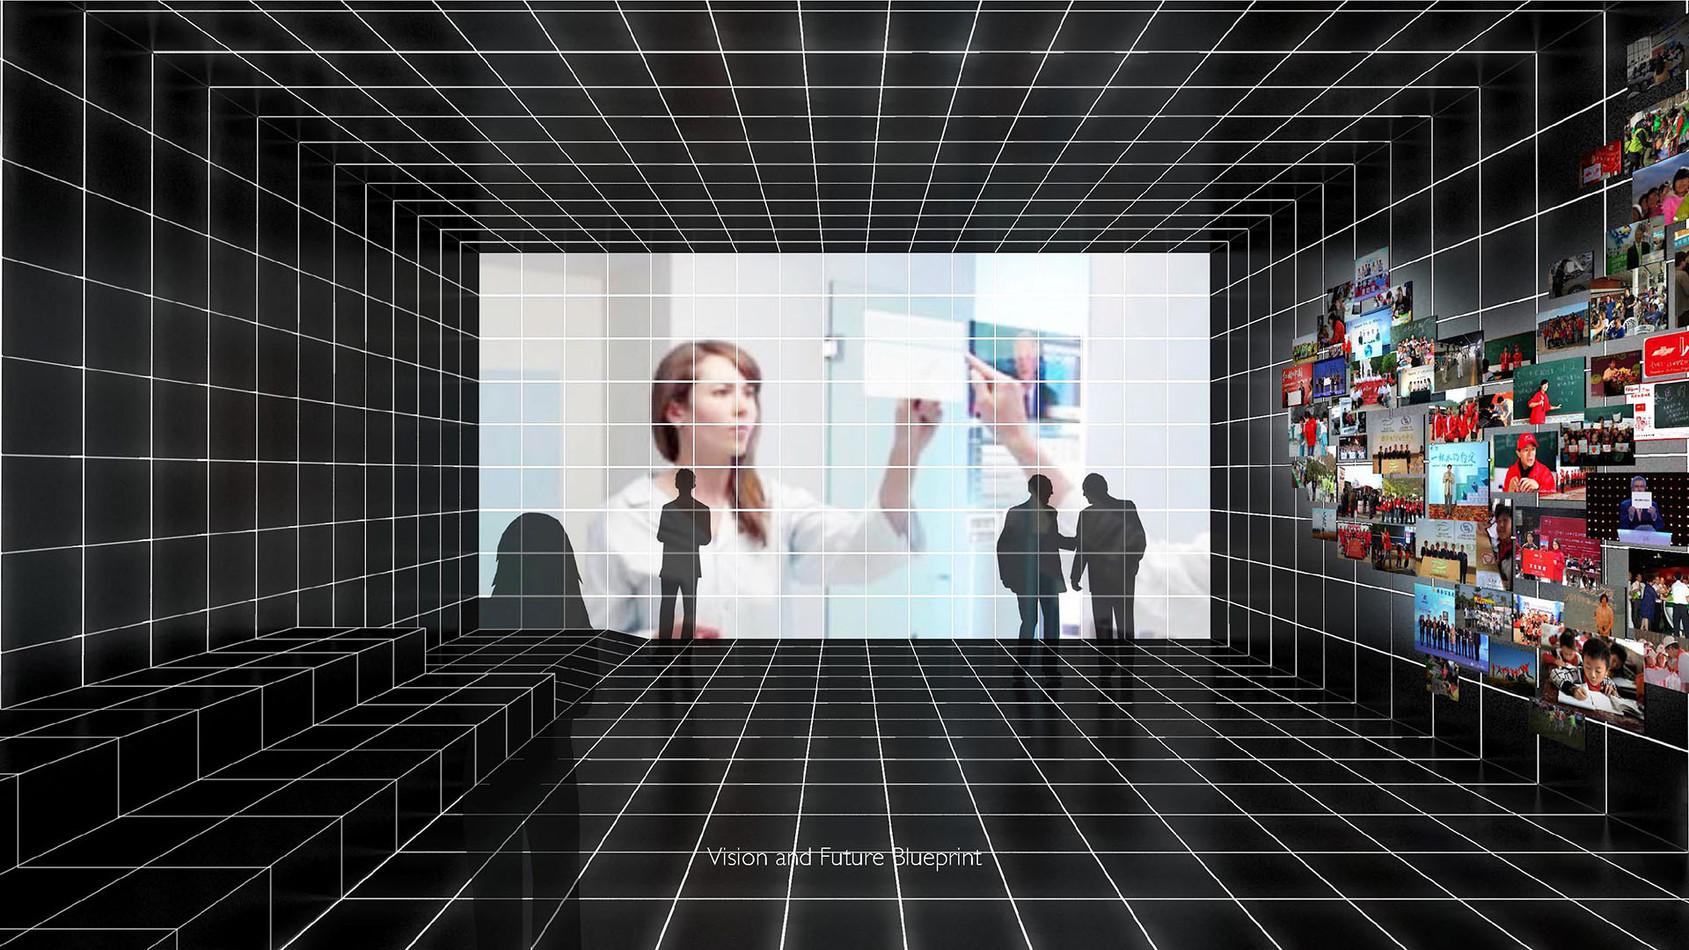 SGM-CORPORATE-MUSEUM-EN 28.jpg